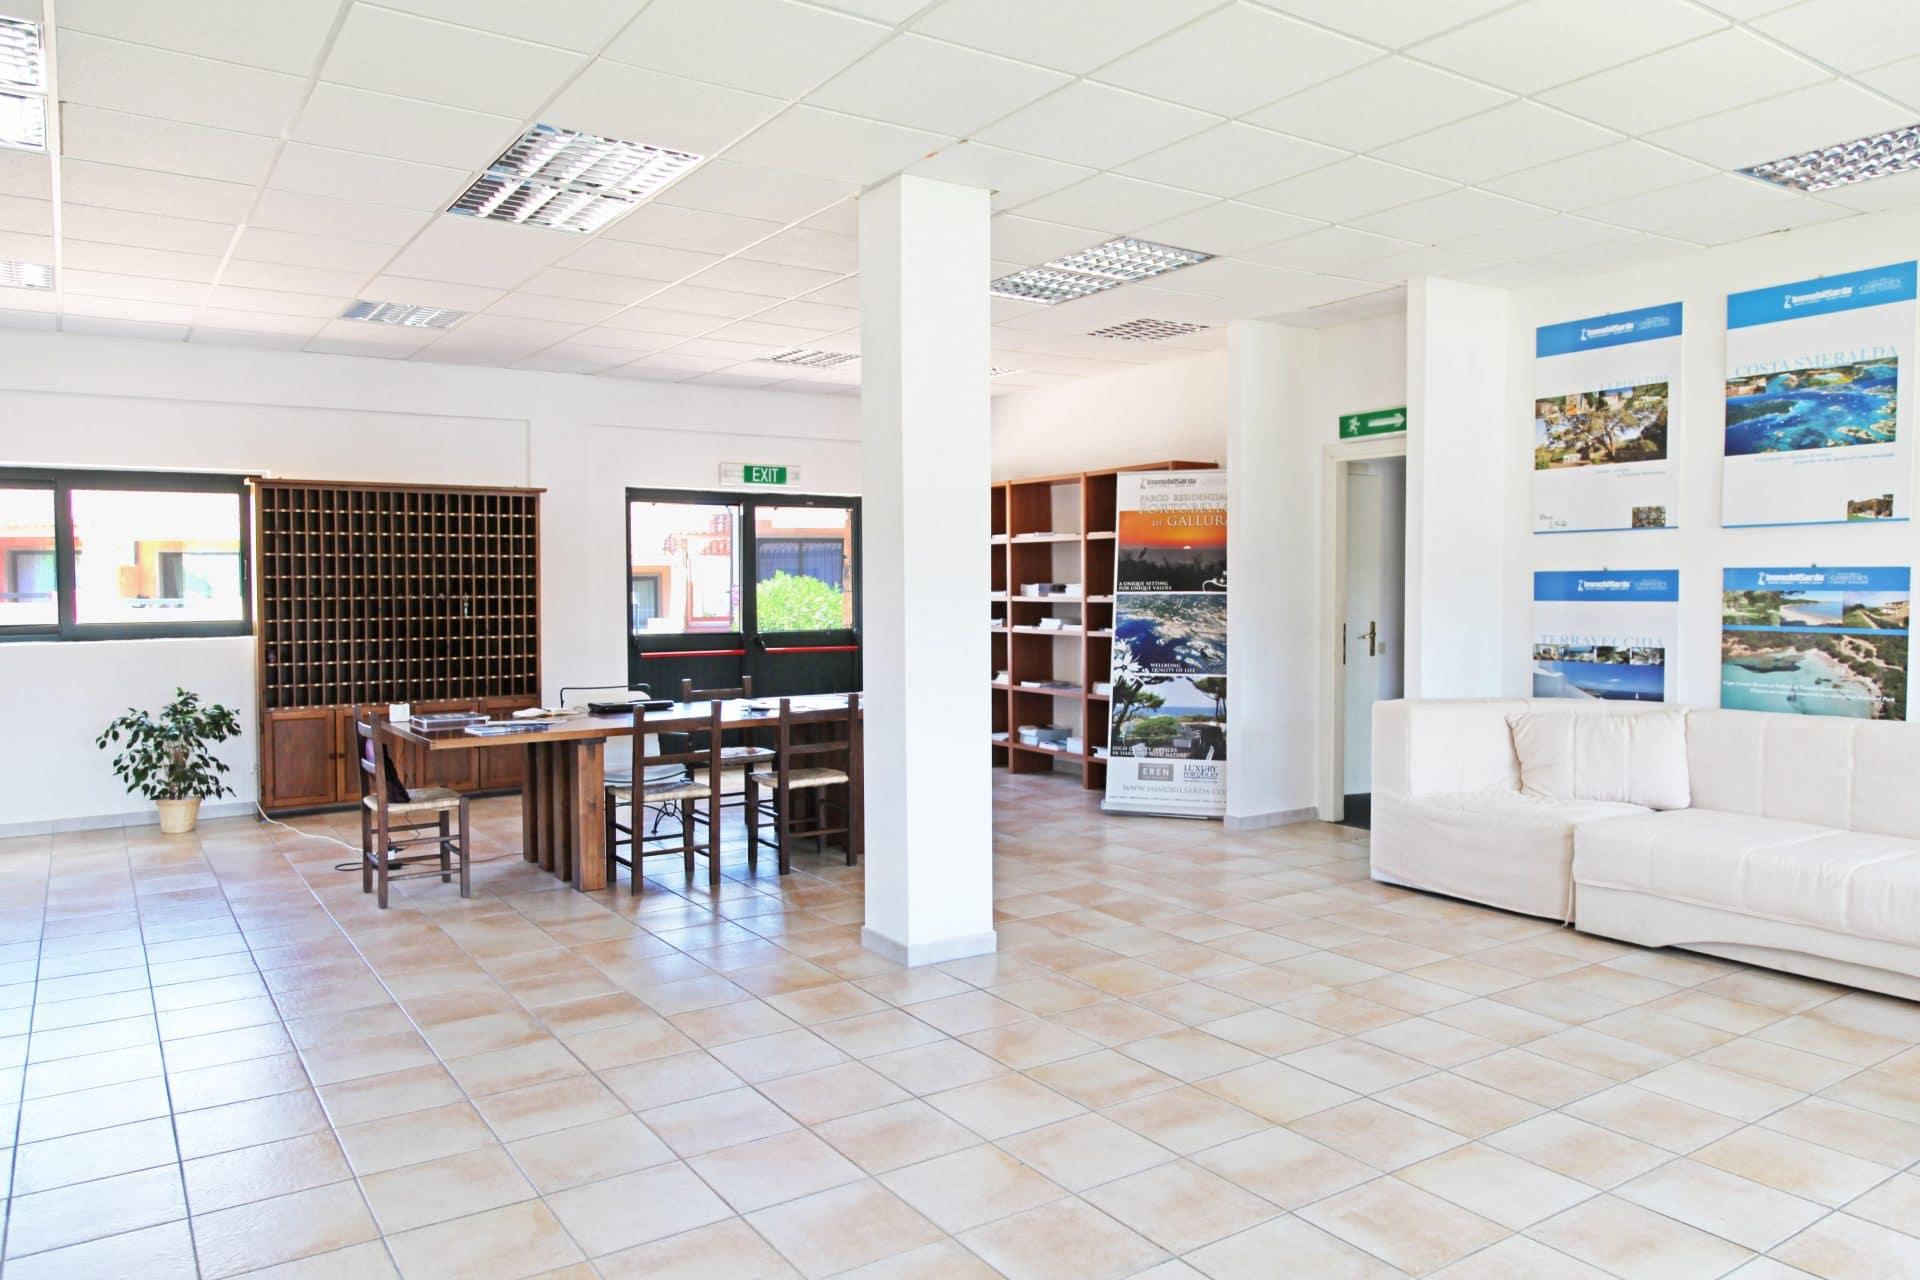 Immobilsarda inaugurates the new Office of Palau